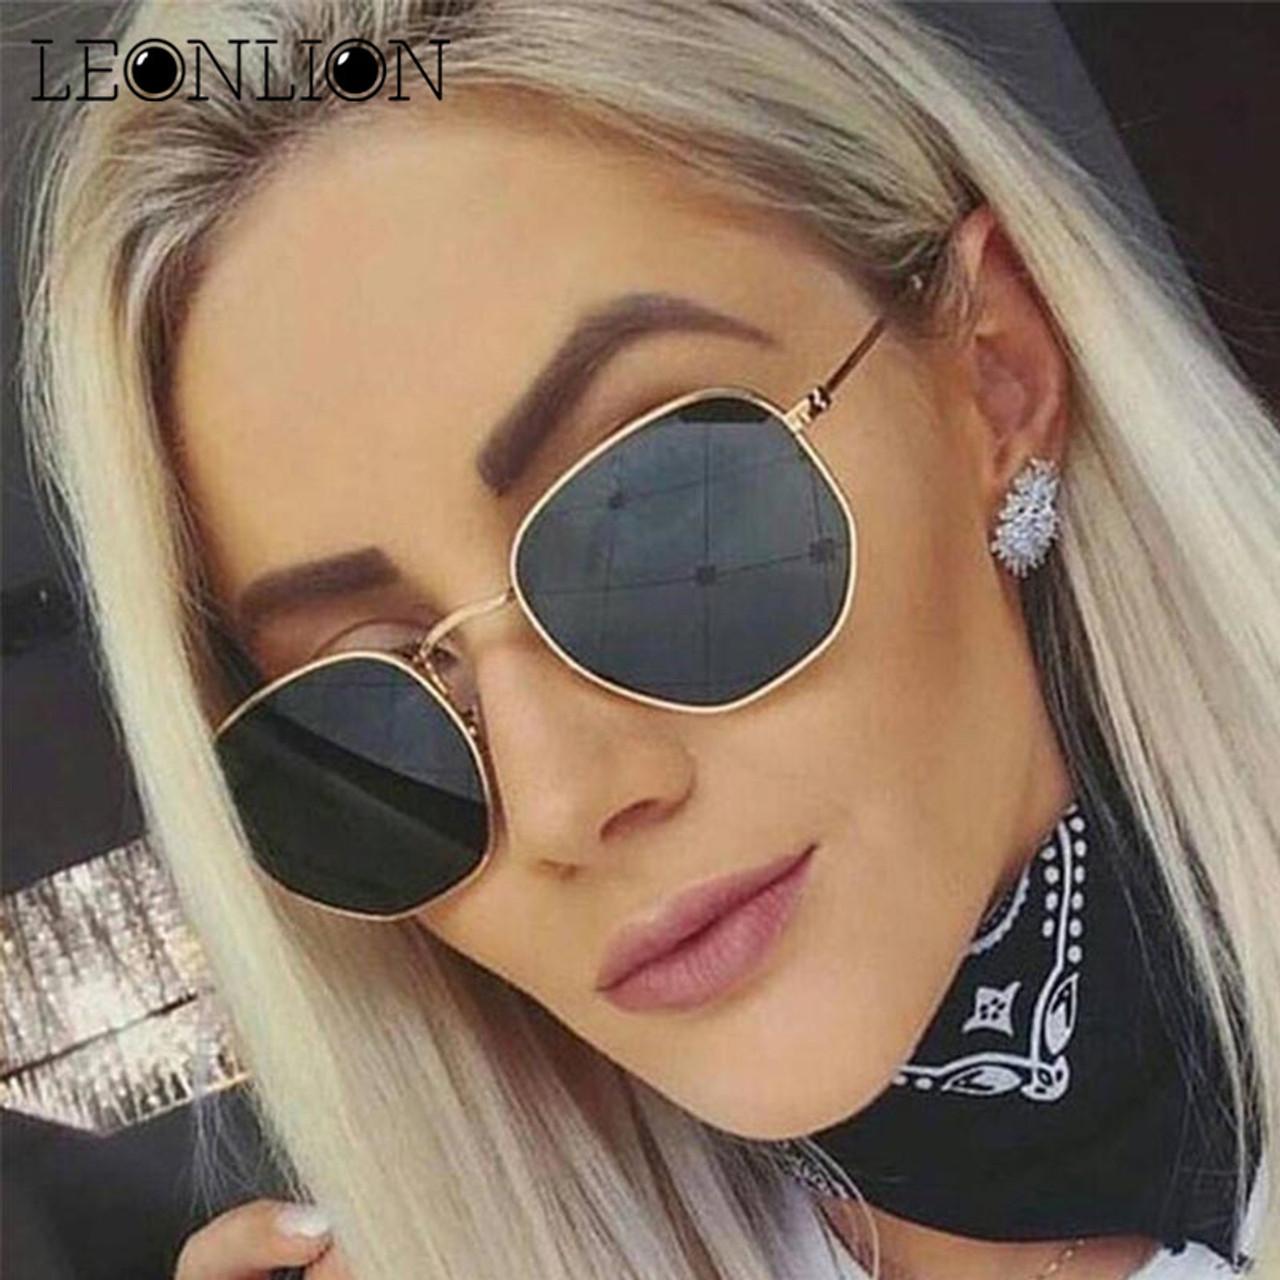 Dankeyisi Vintage Sunglasses Women Square Sunglasses Men Designer Sun Glasses Girl Retro Ladies Sunglass Uv400 Big Clearance Sale Women's Sunglasses Apparel Accessories